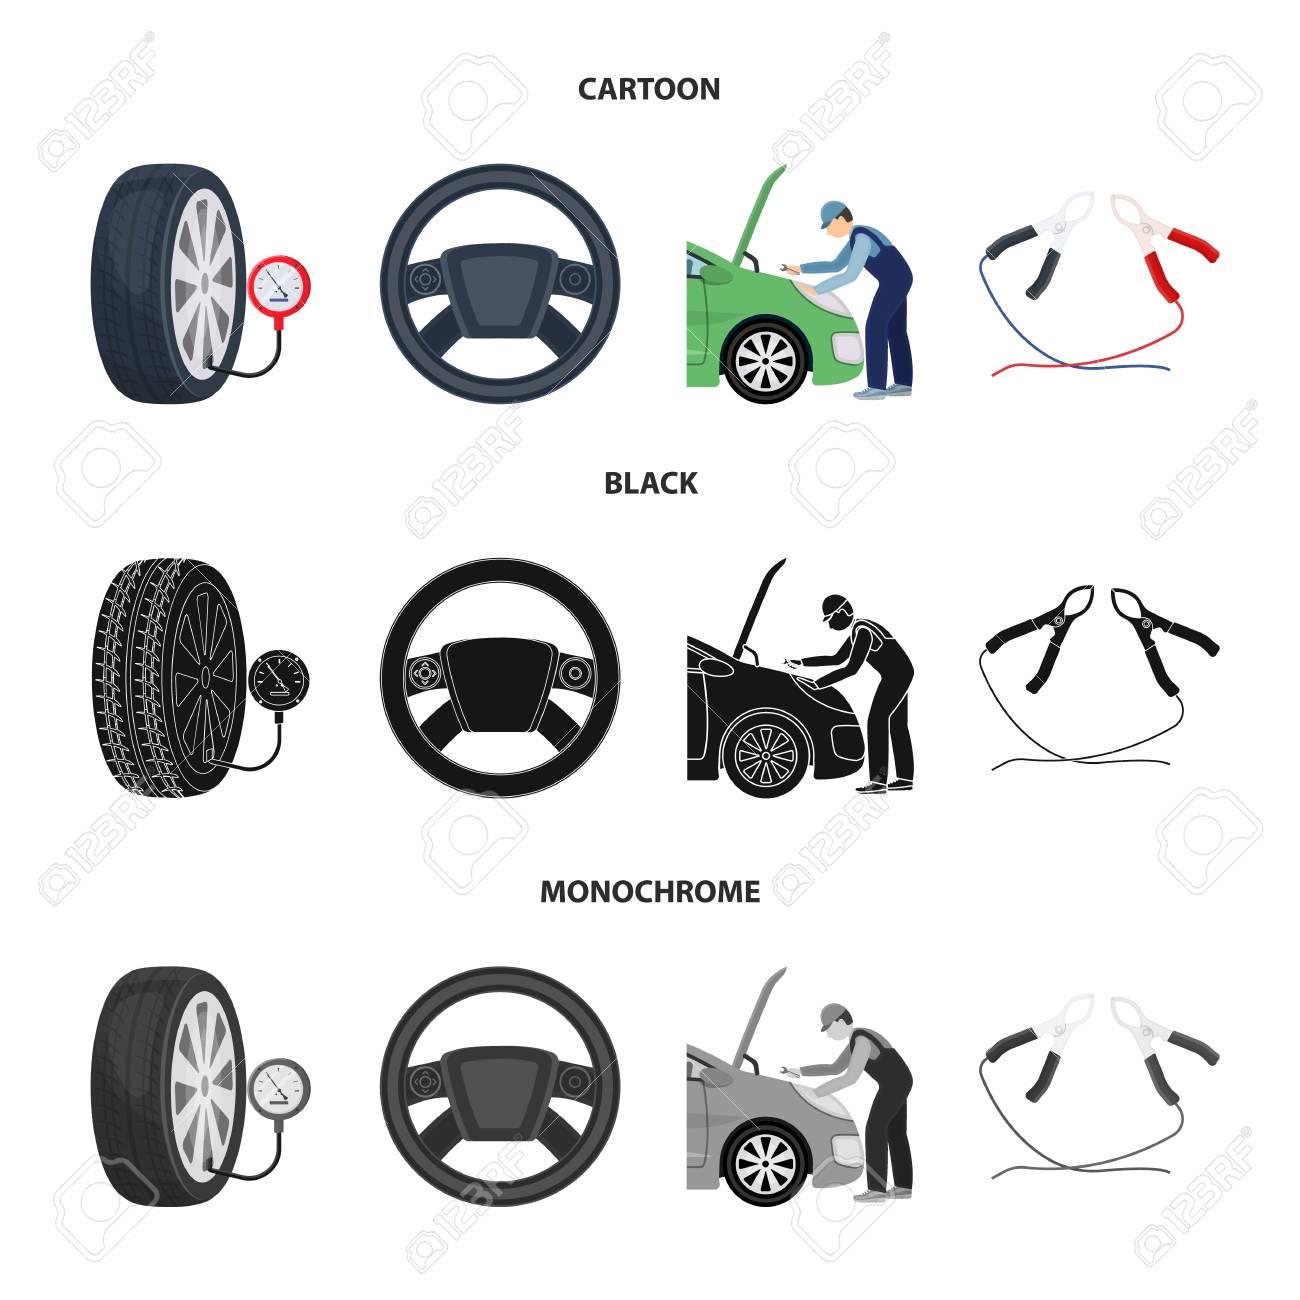 engine adjustment steering wheel clamp and wheel cartoon black